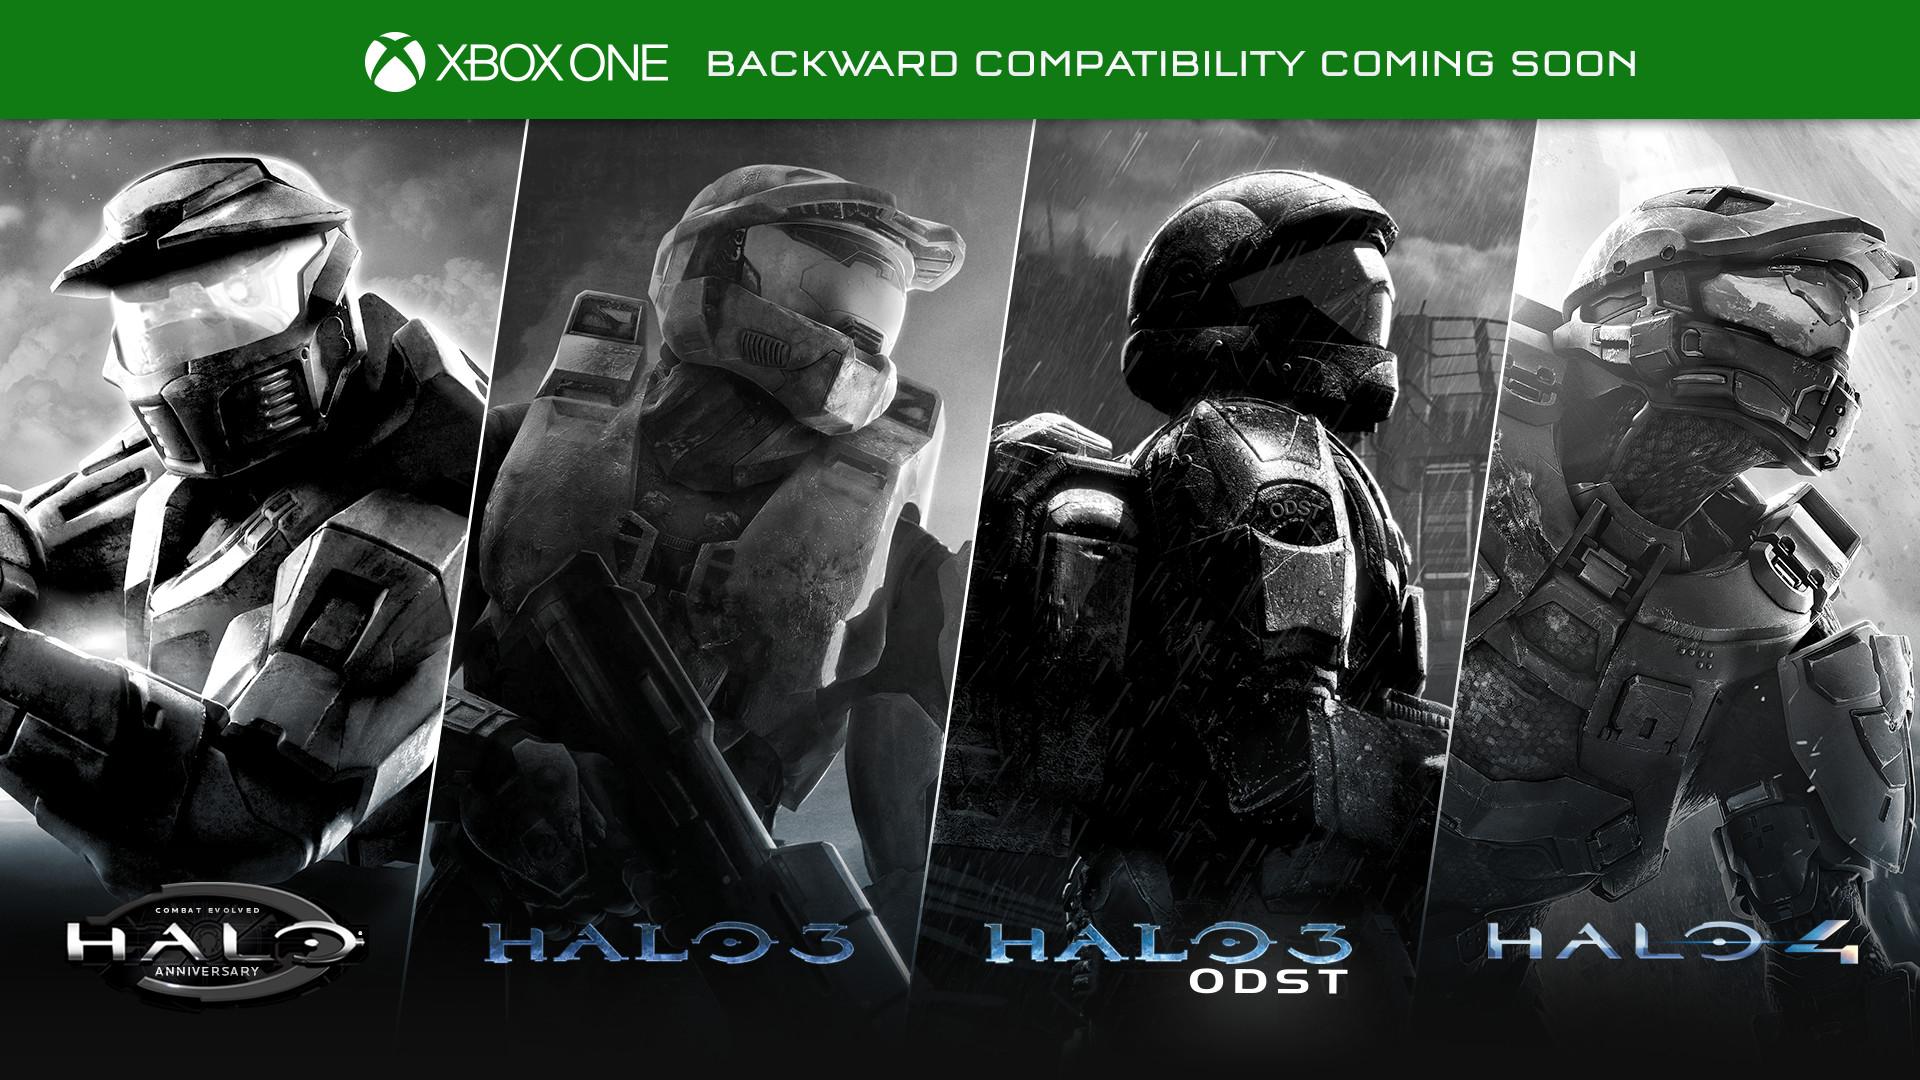 Microsoft adds four Halo games to Xbox One Backward